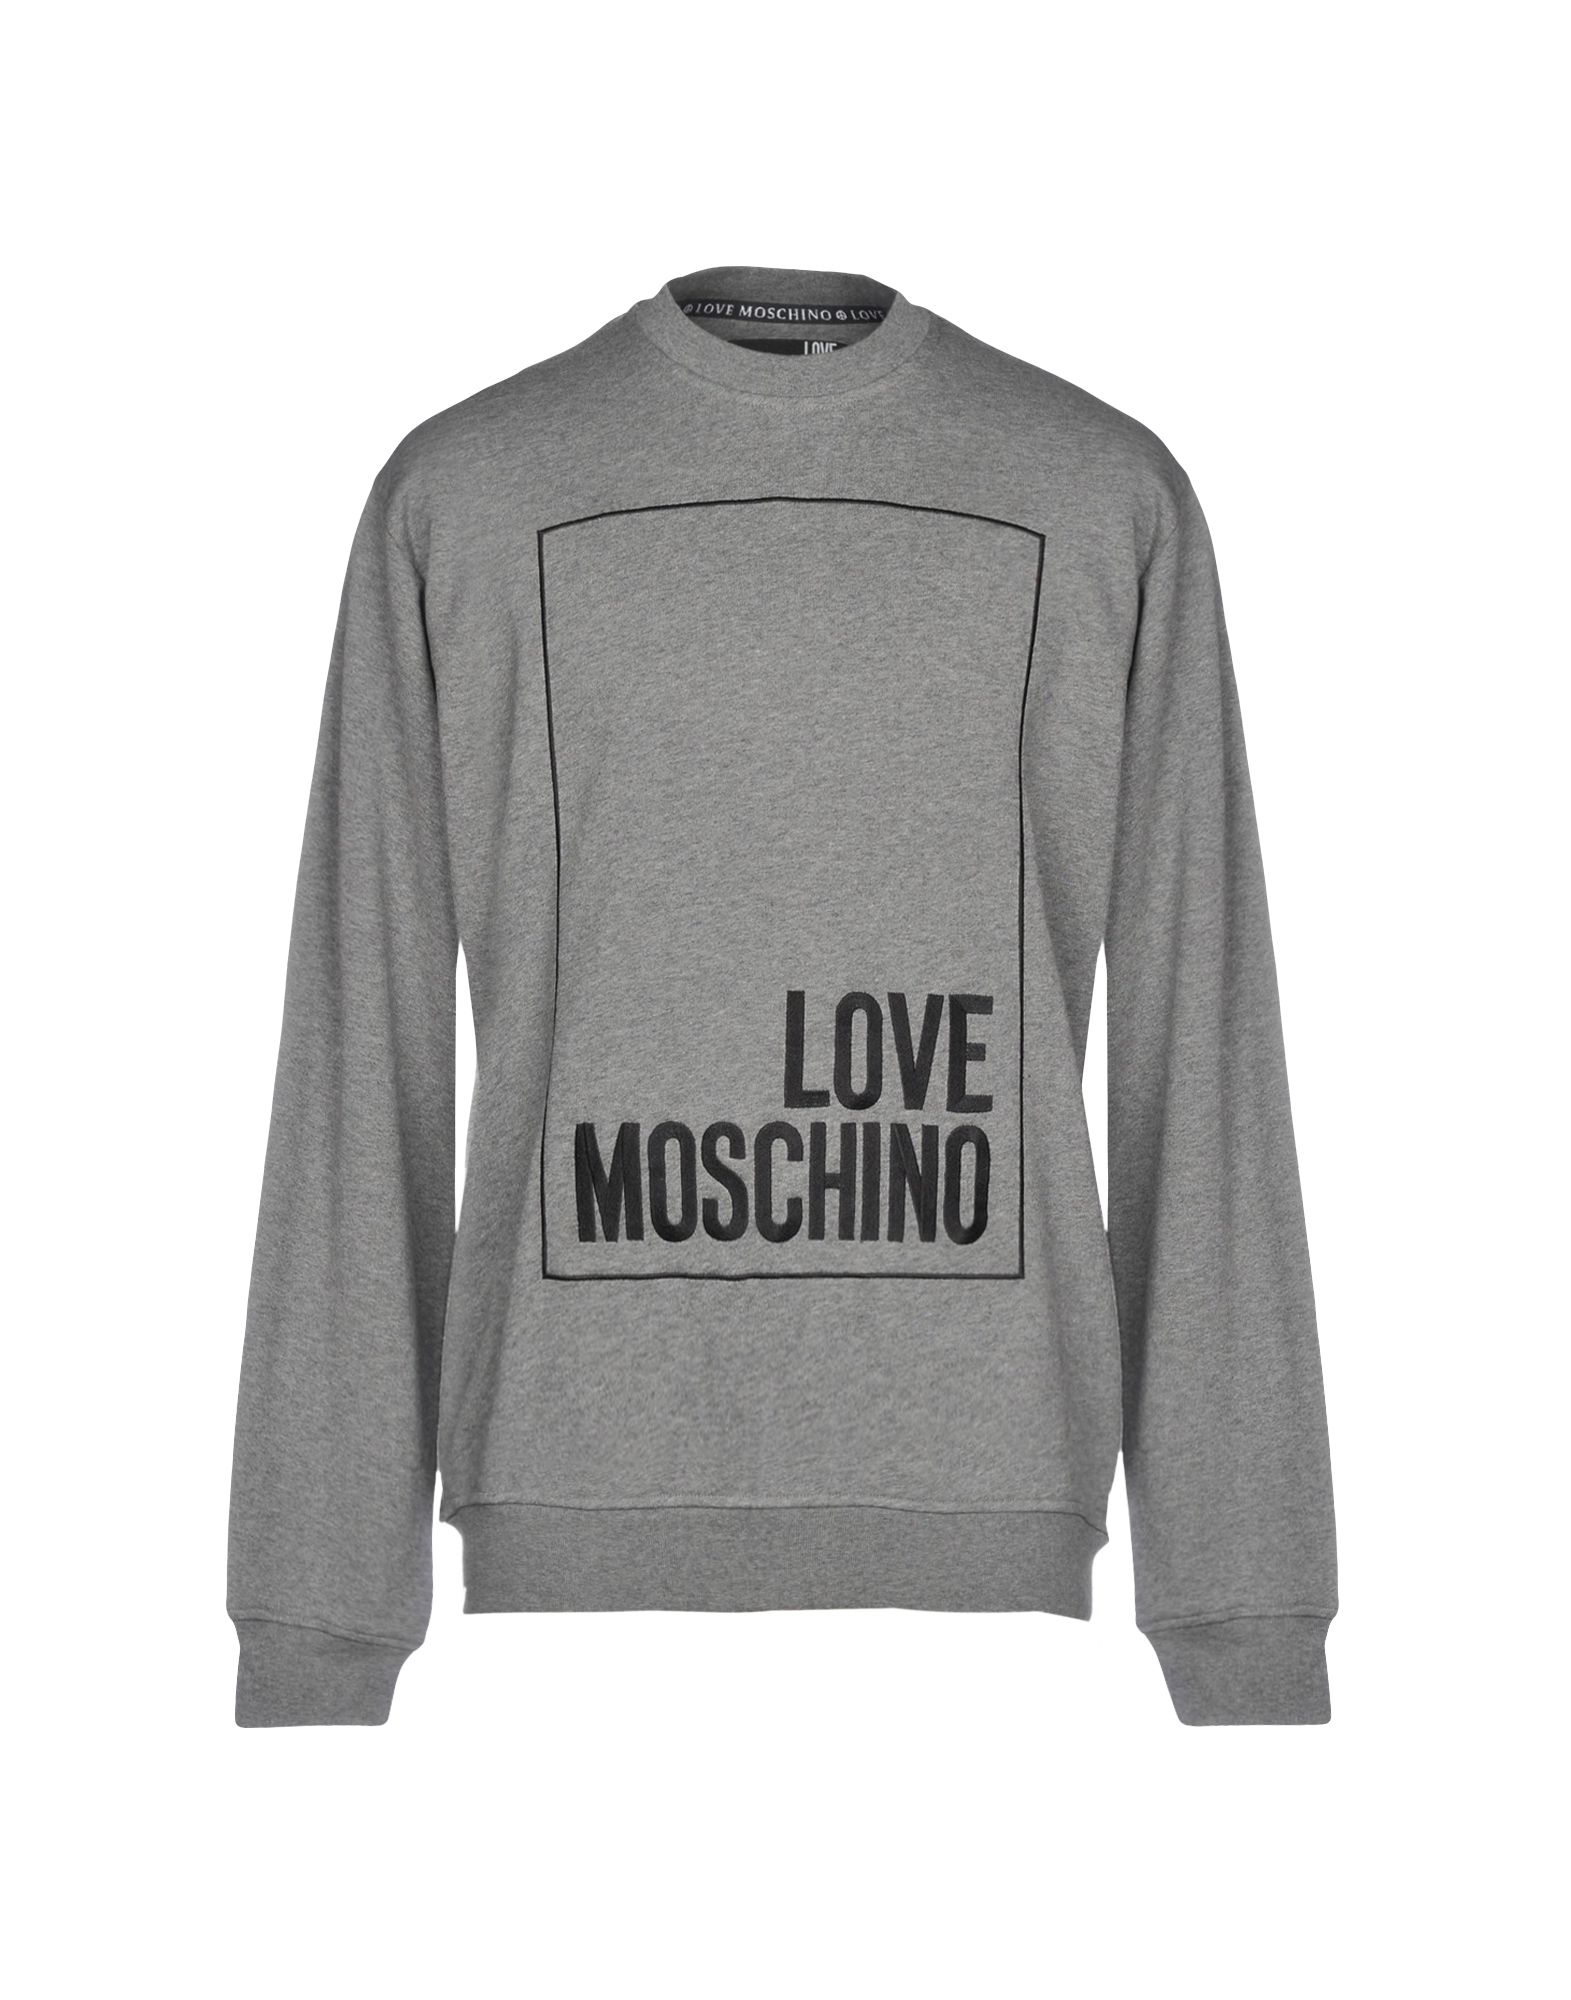 LOVE MOSCHINO Толстовка толстовка детская love son health 33339508 80 130m